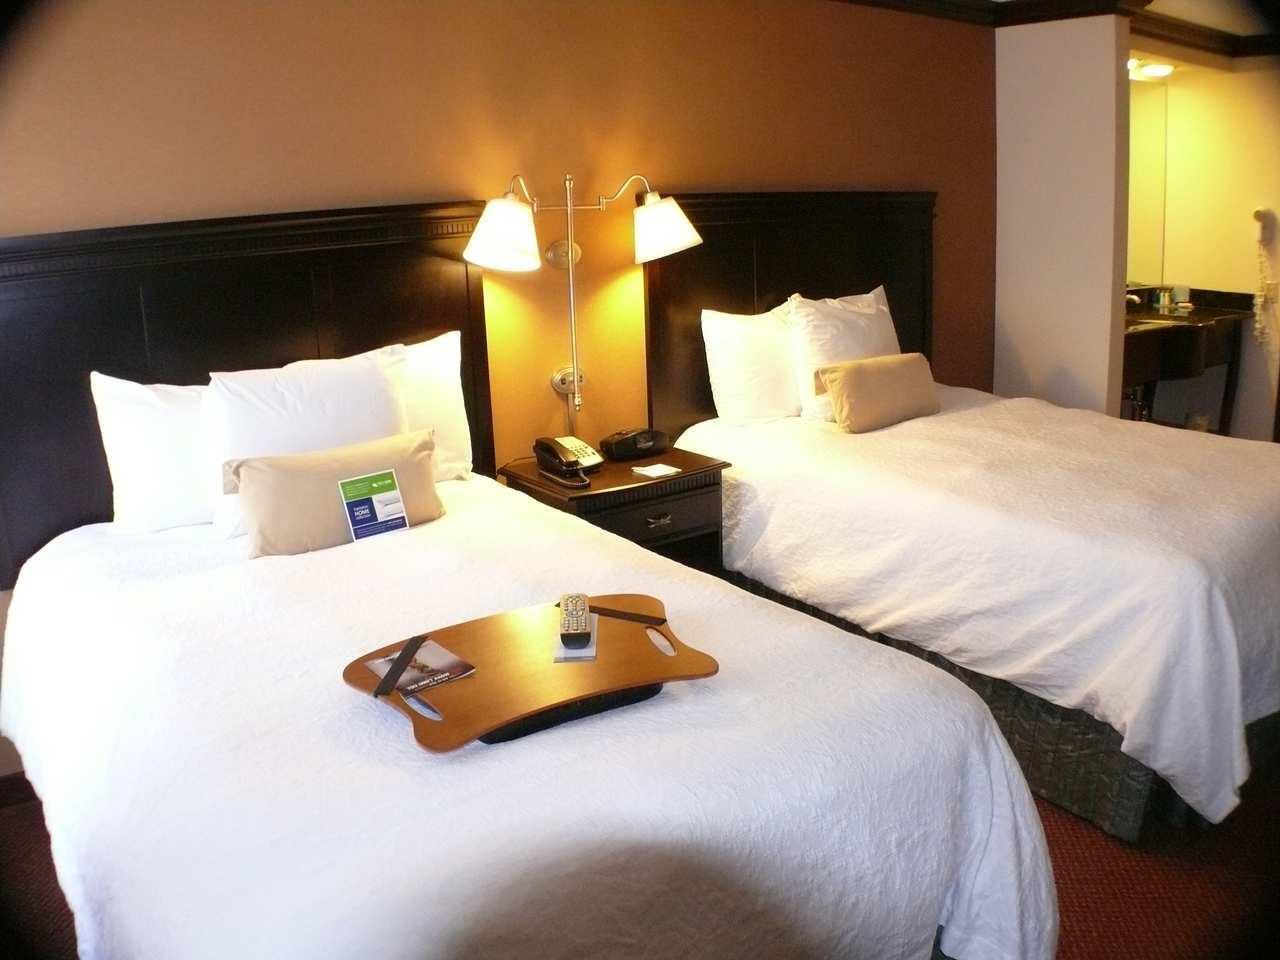 Hampton Inn & Suites Chicago/Hoffman Estates image 15